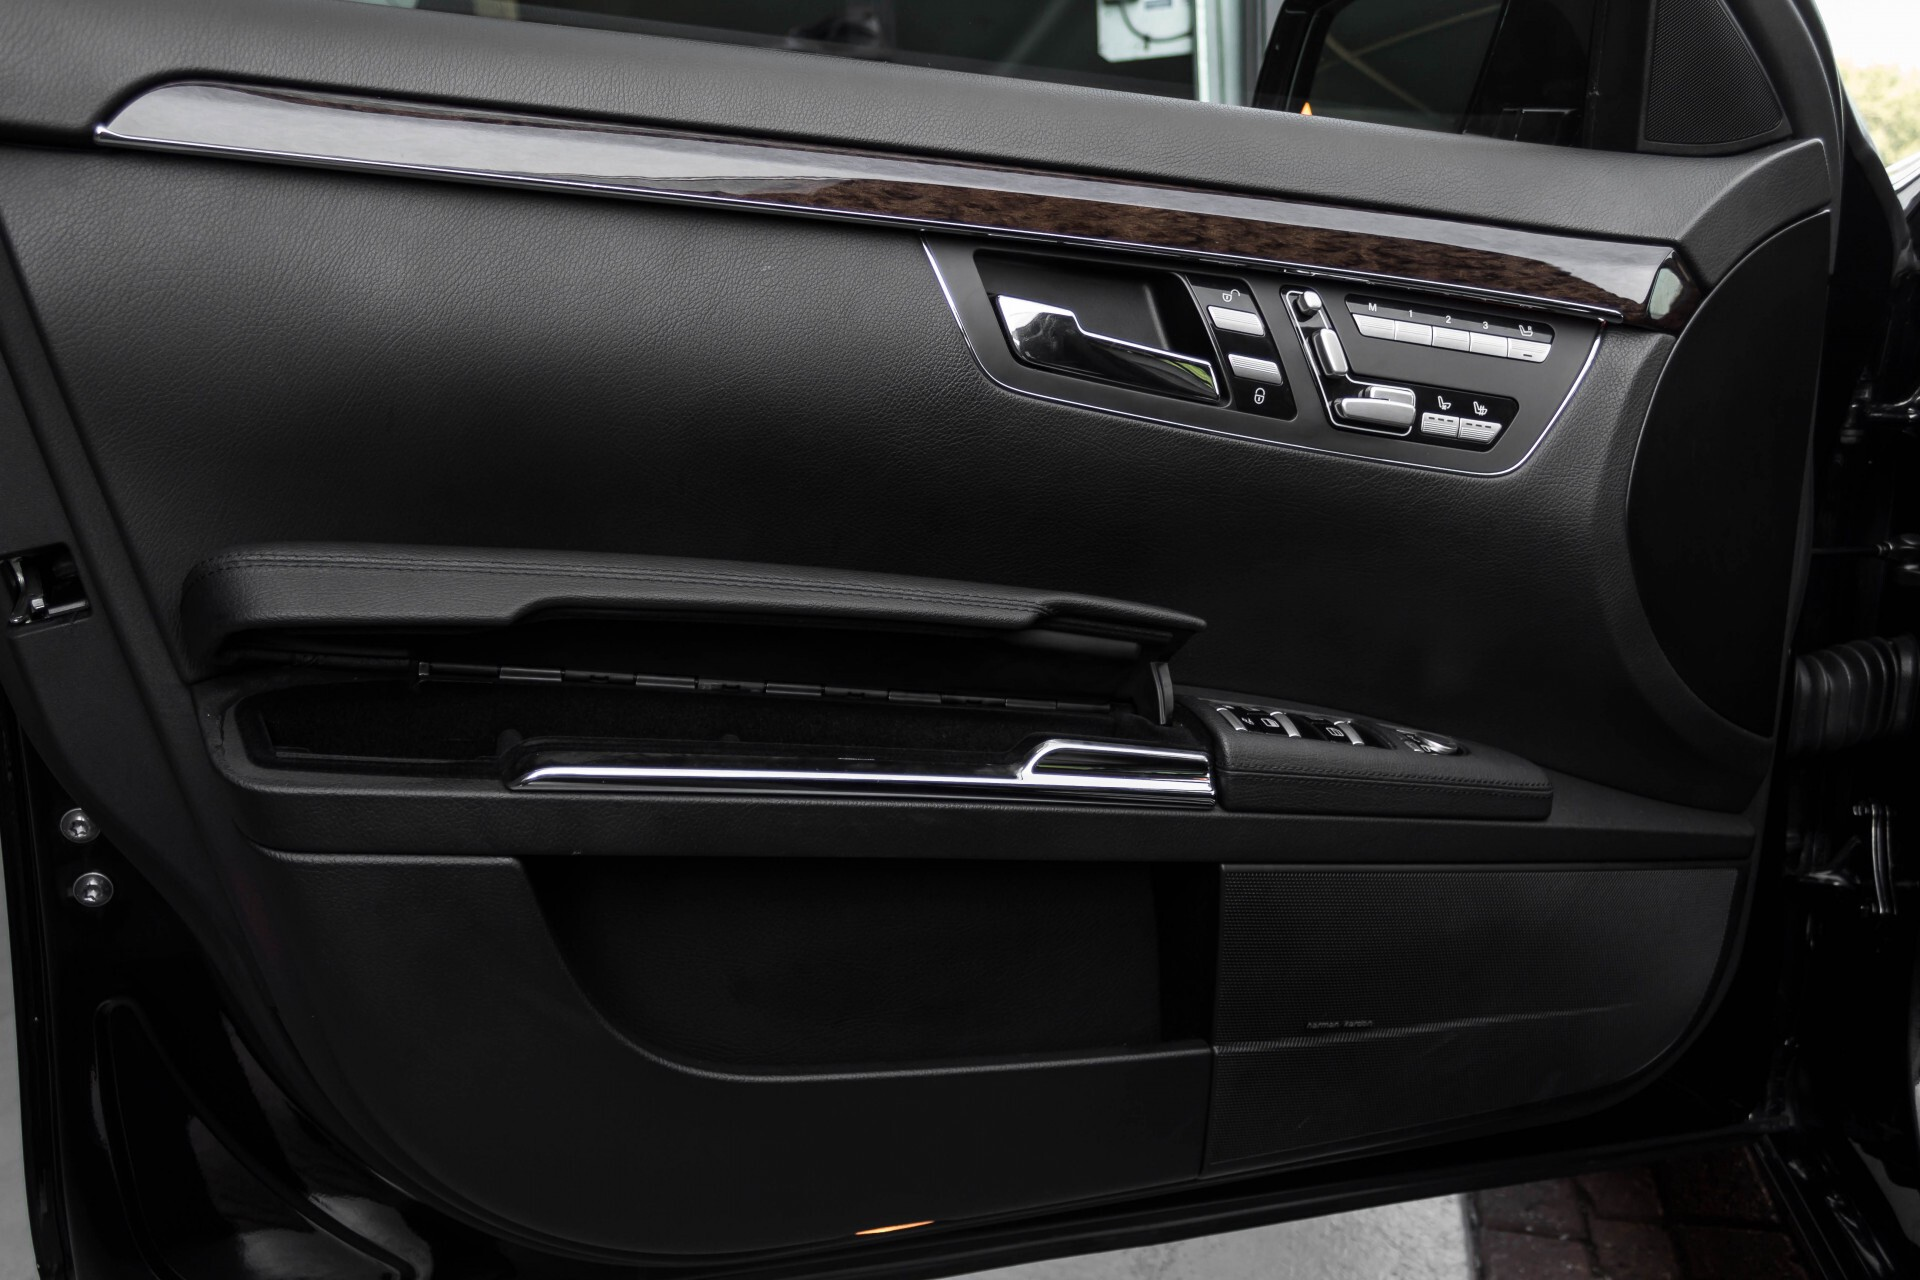 Mercedes-Benz S-Klasse 350 Bluetec Keyless/Distronic/Nightvision/Schuifdak/Harman-Kardon Aut7 Foto 39